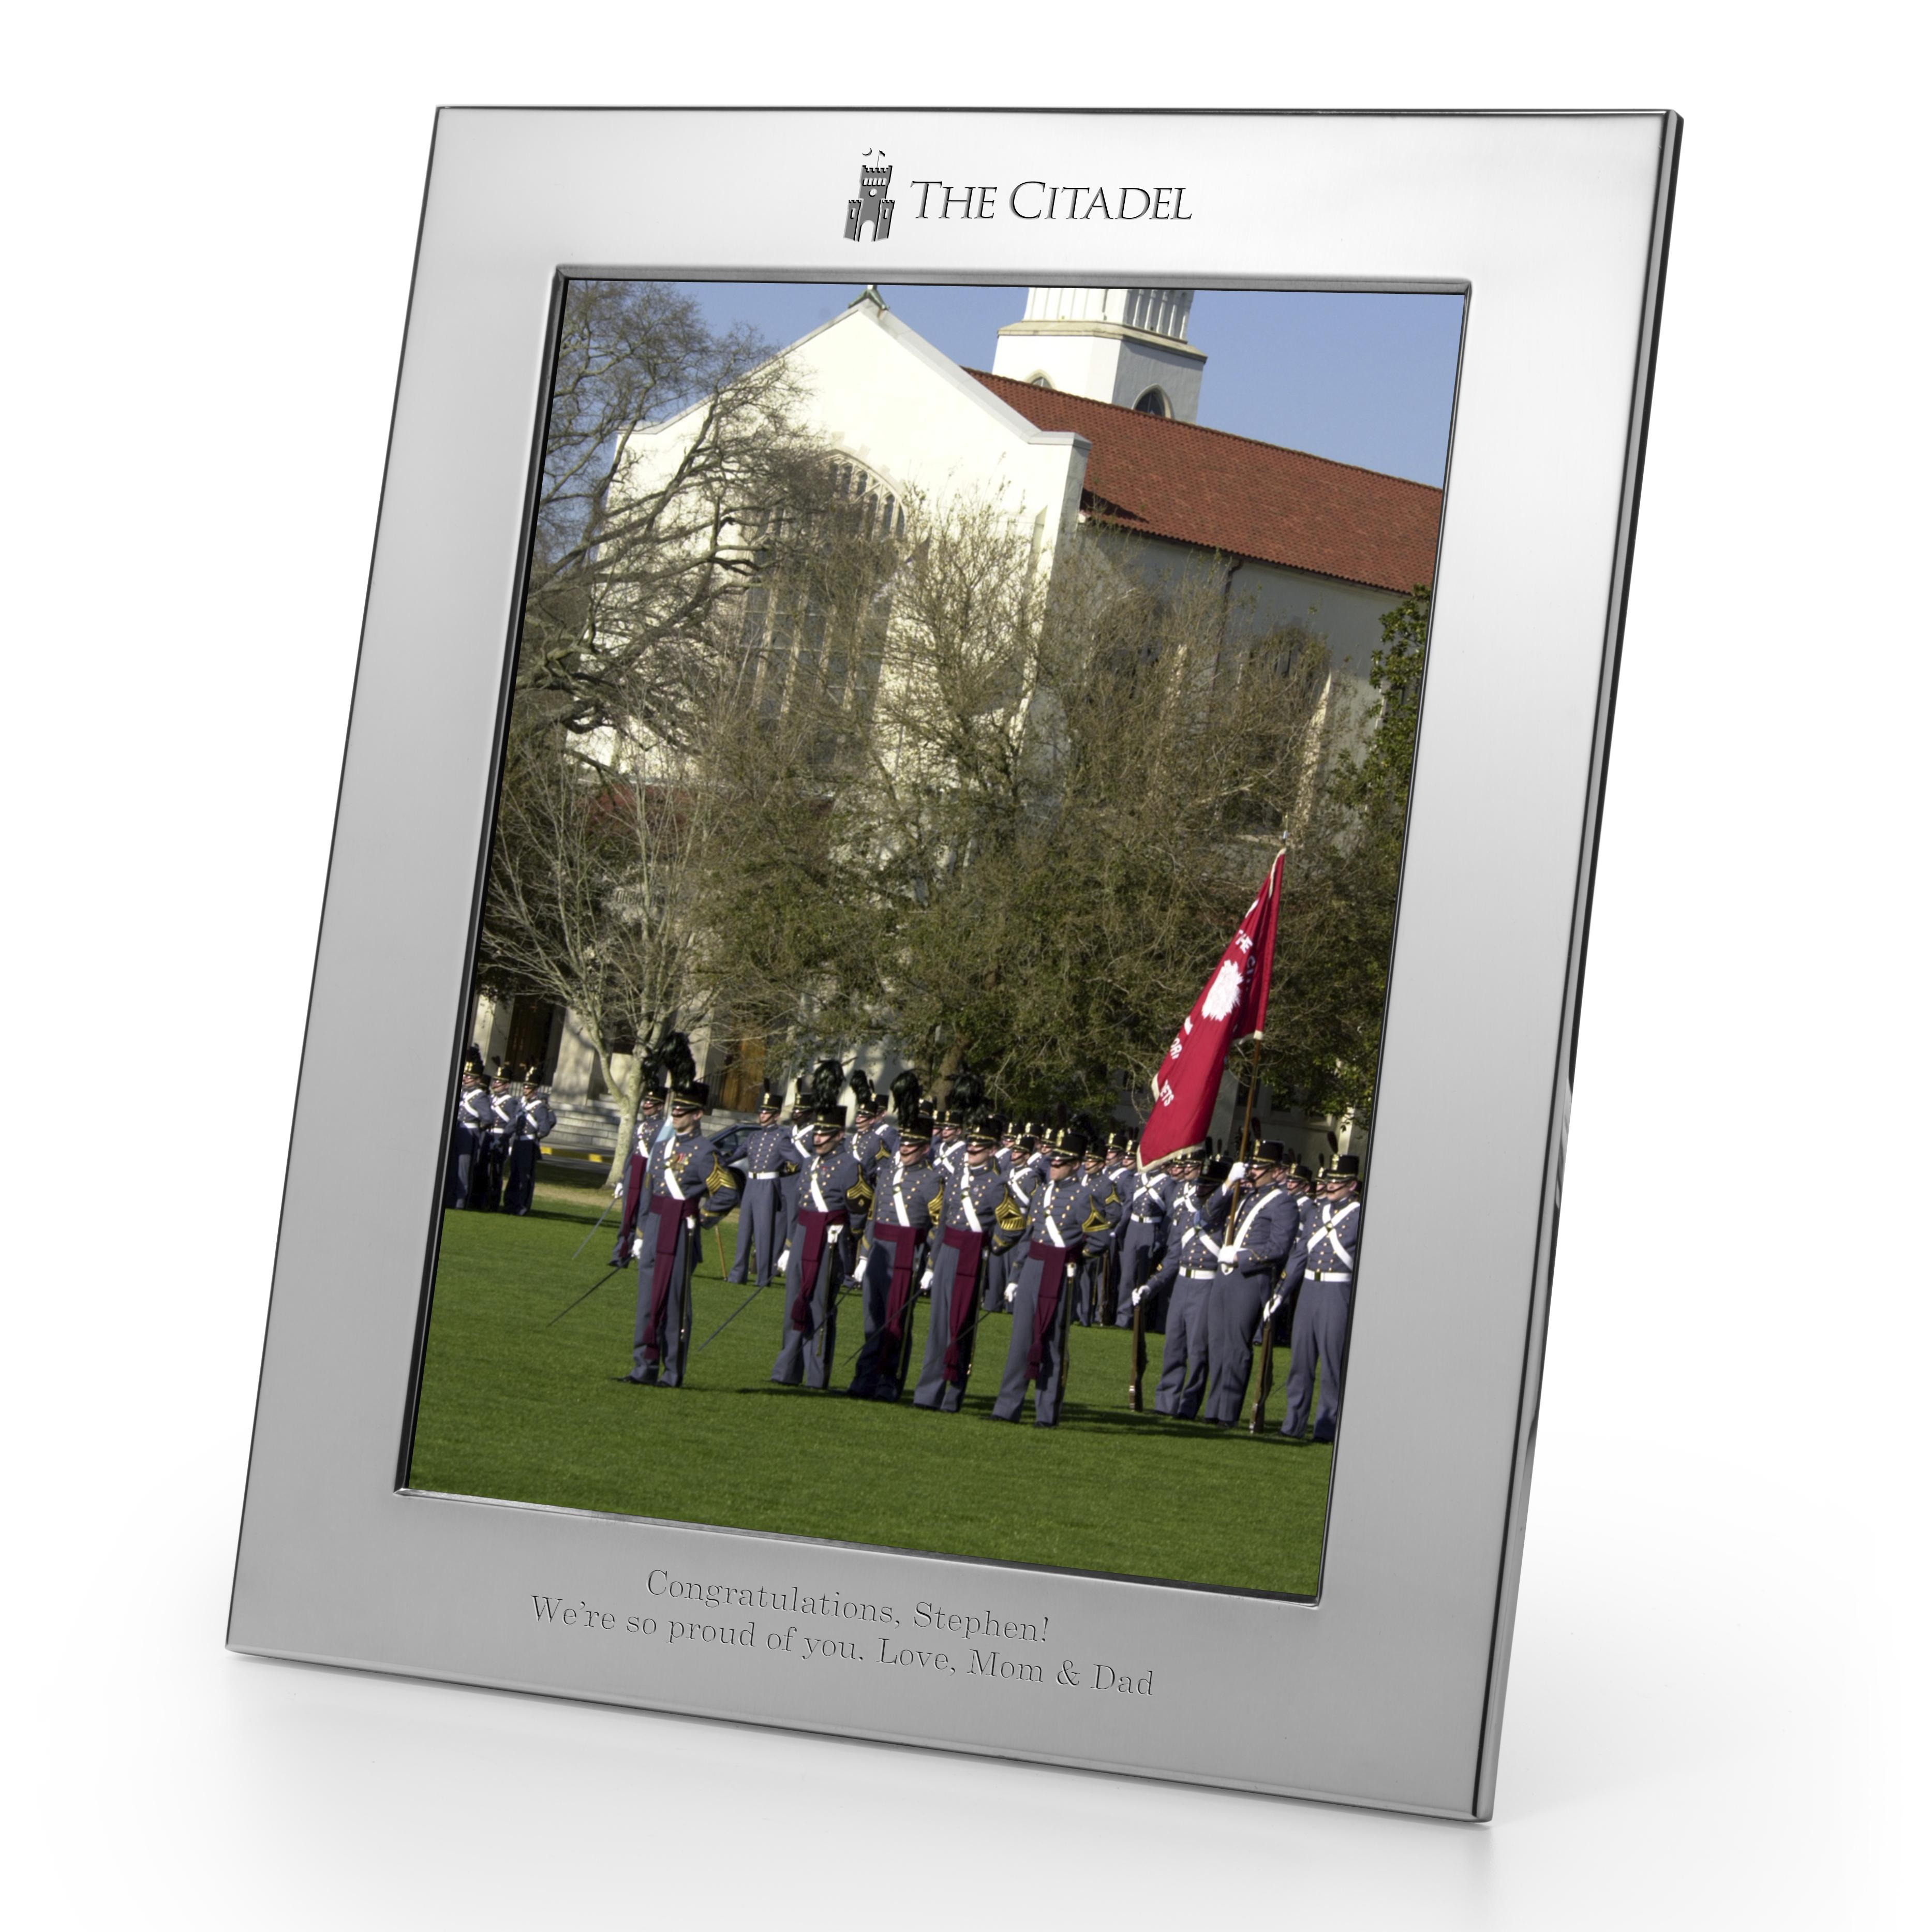 Citadel Polished Pewter 8x10 Picture Frame